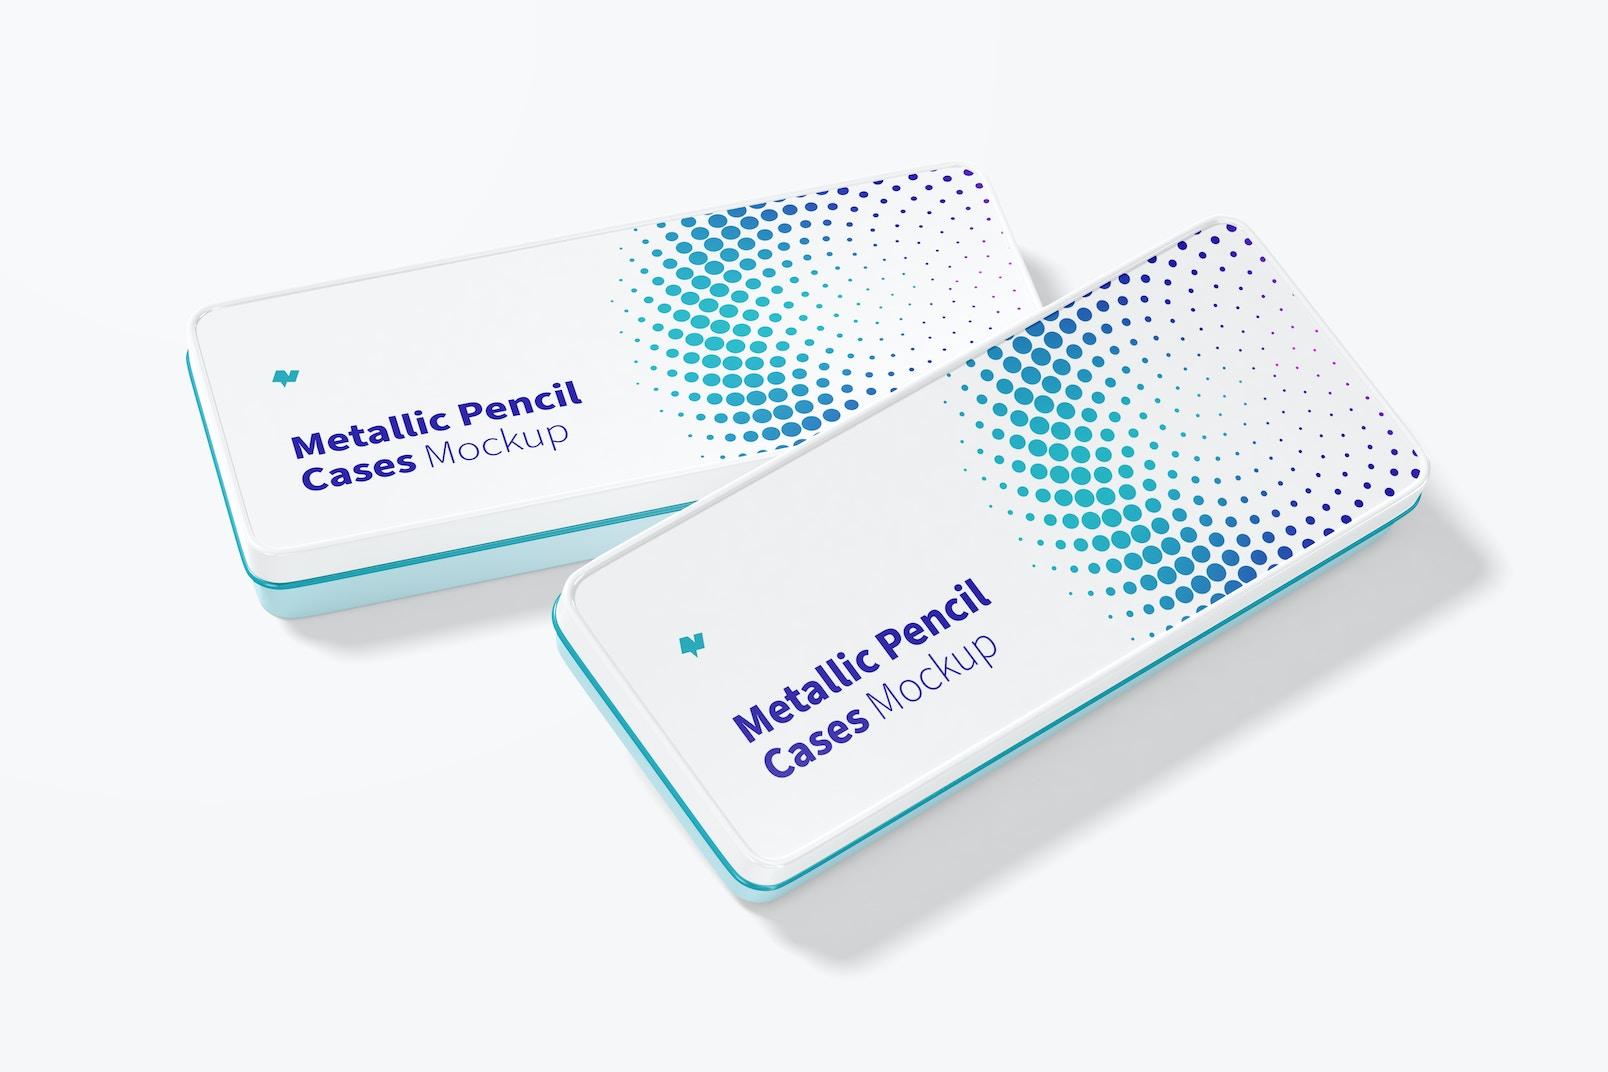 Metallic Pencil Cases Mockup, Top View